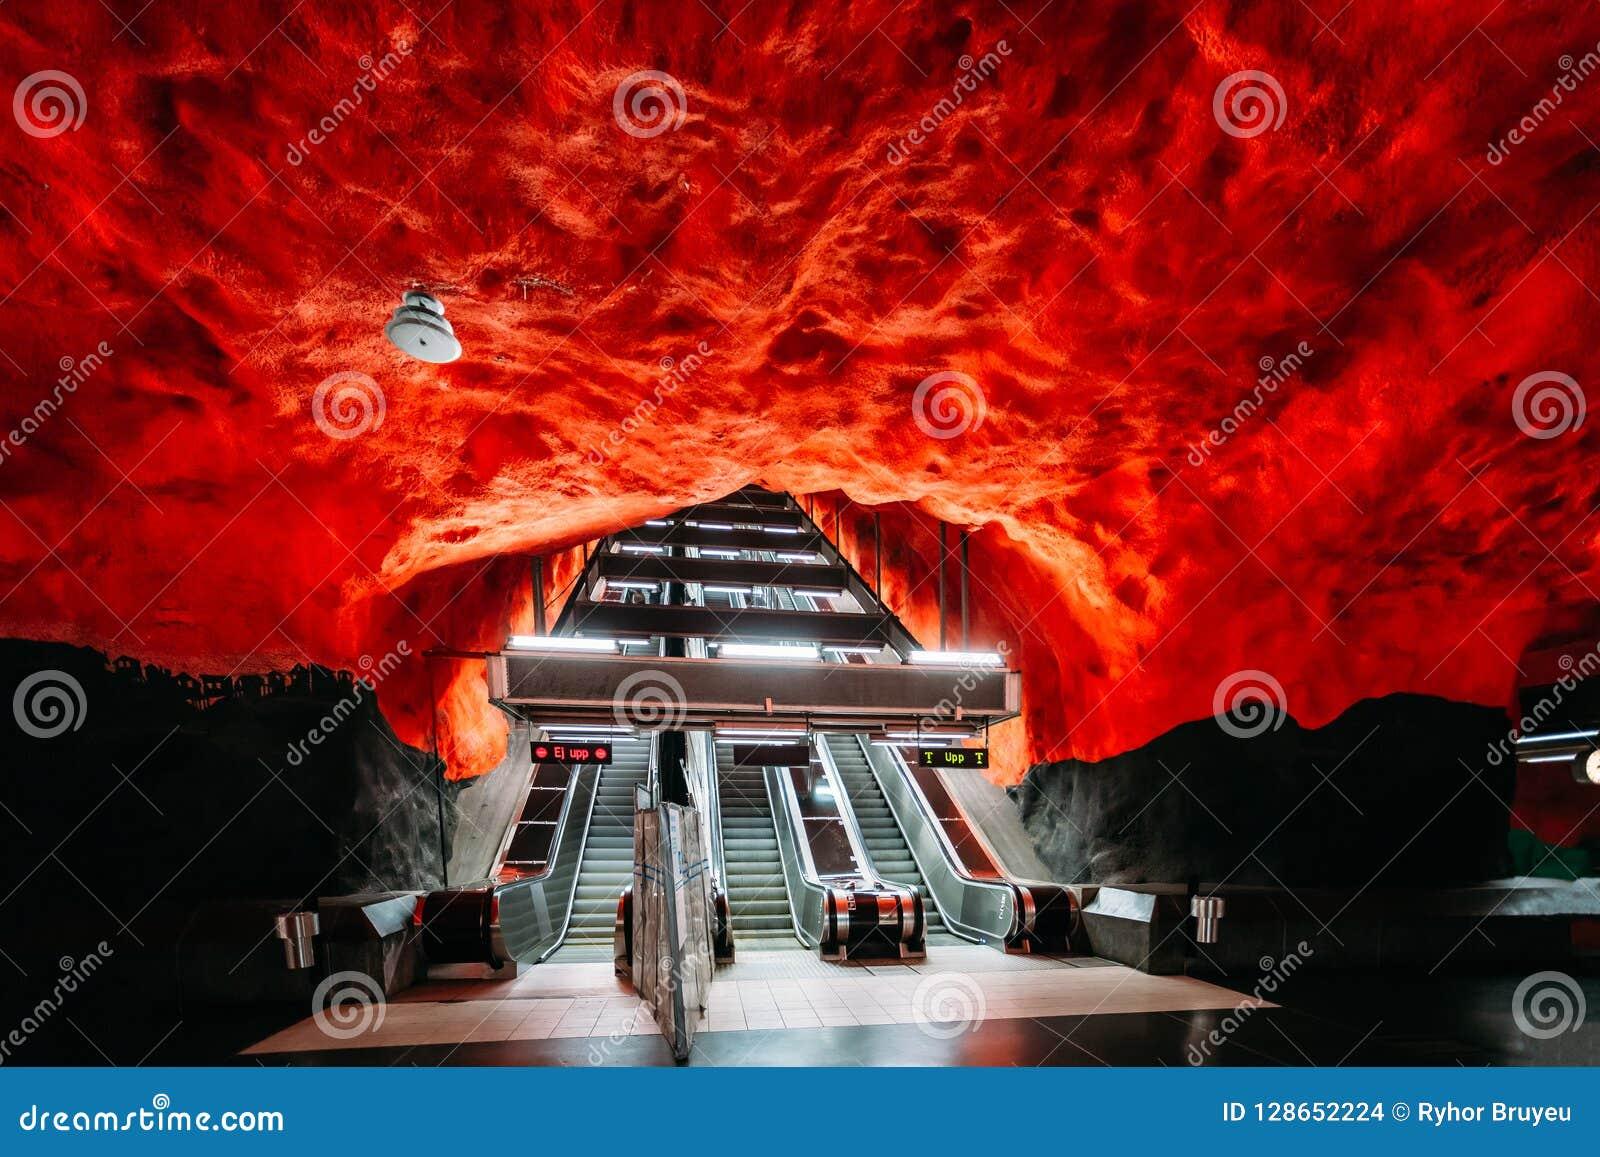 Stockholm, Sweden. Escalator in Stockholm Metro Underground Subw